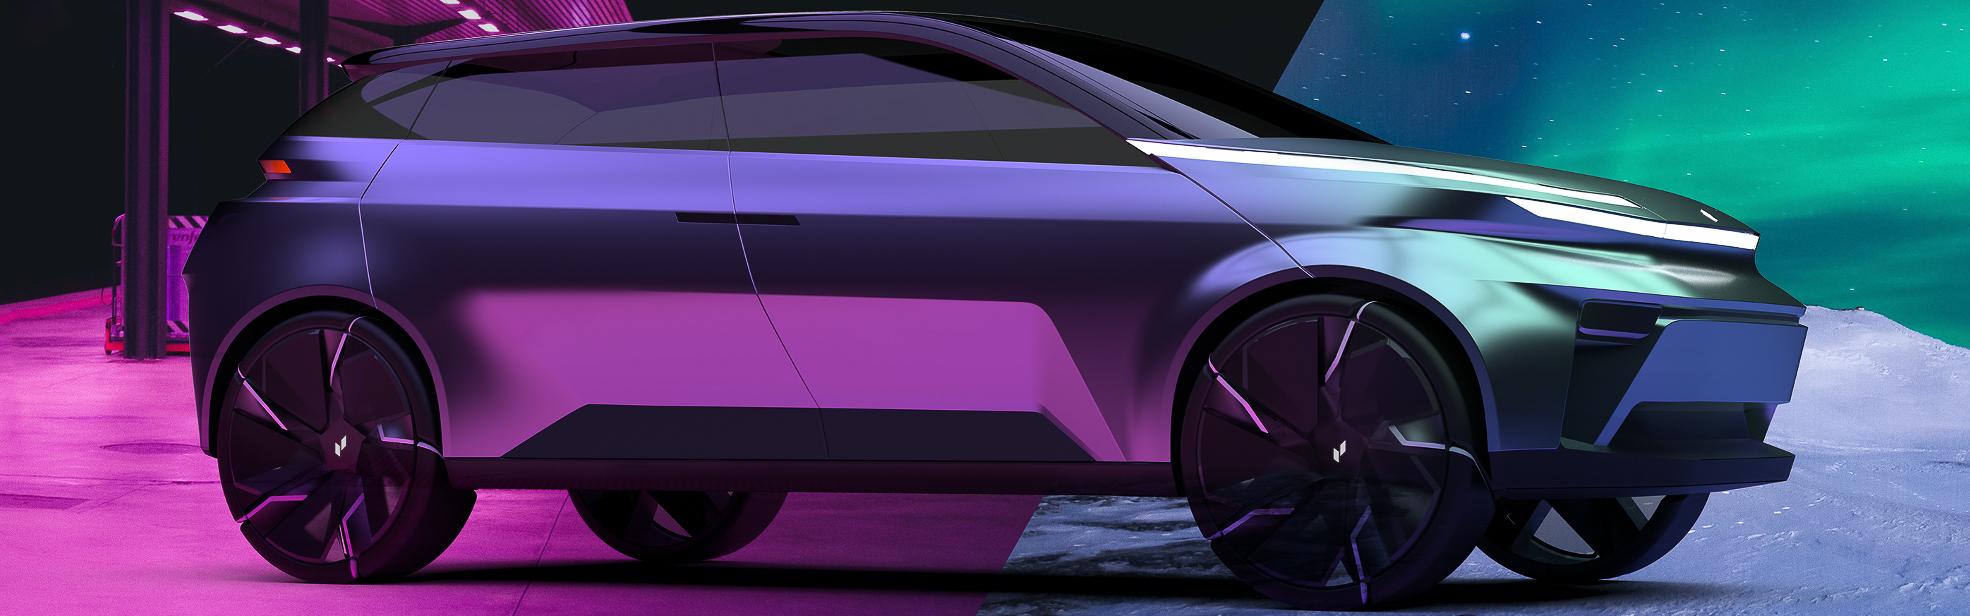 Concept Vehicle - Angle 3